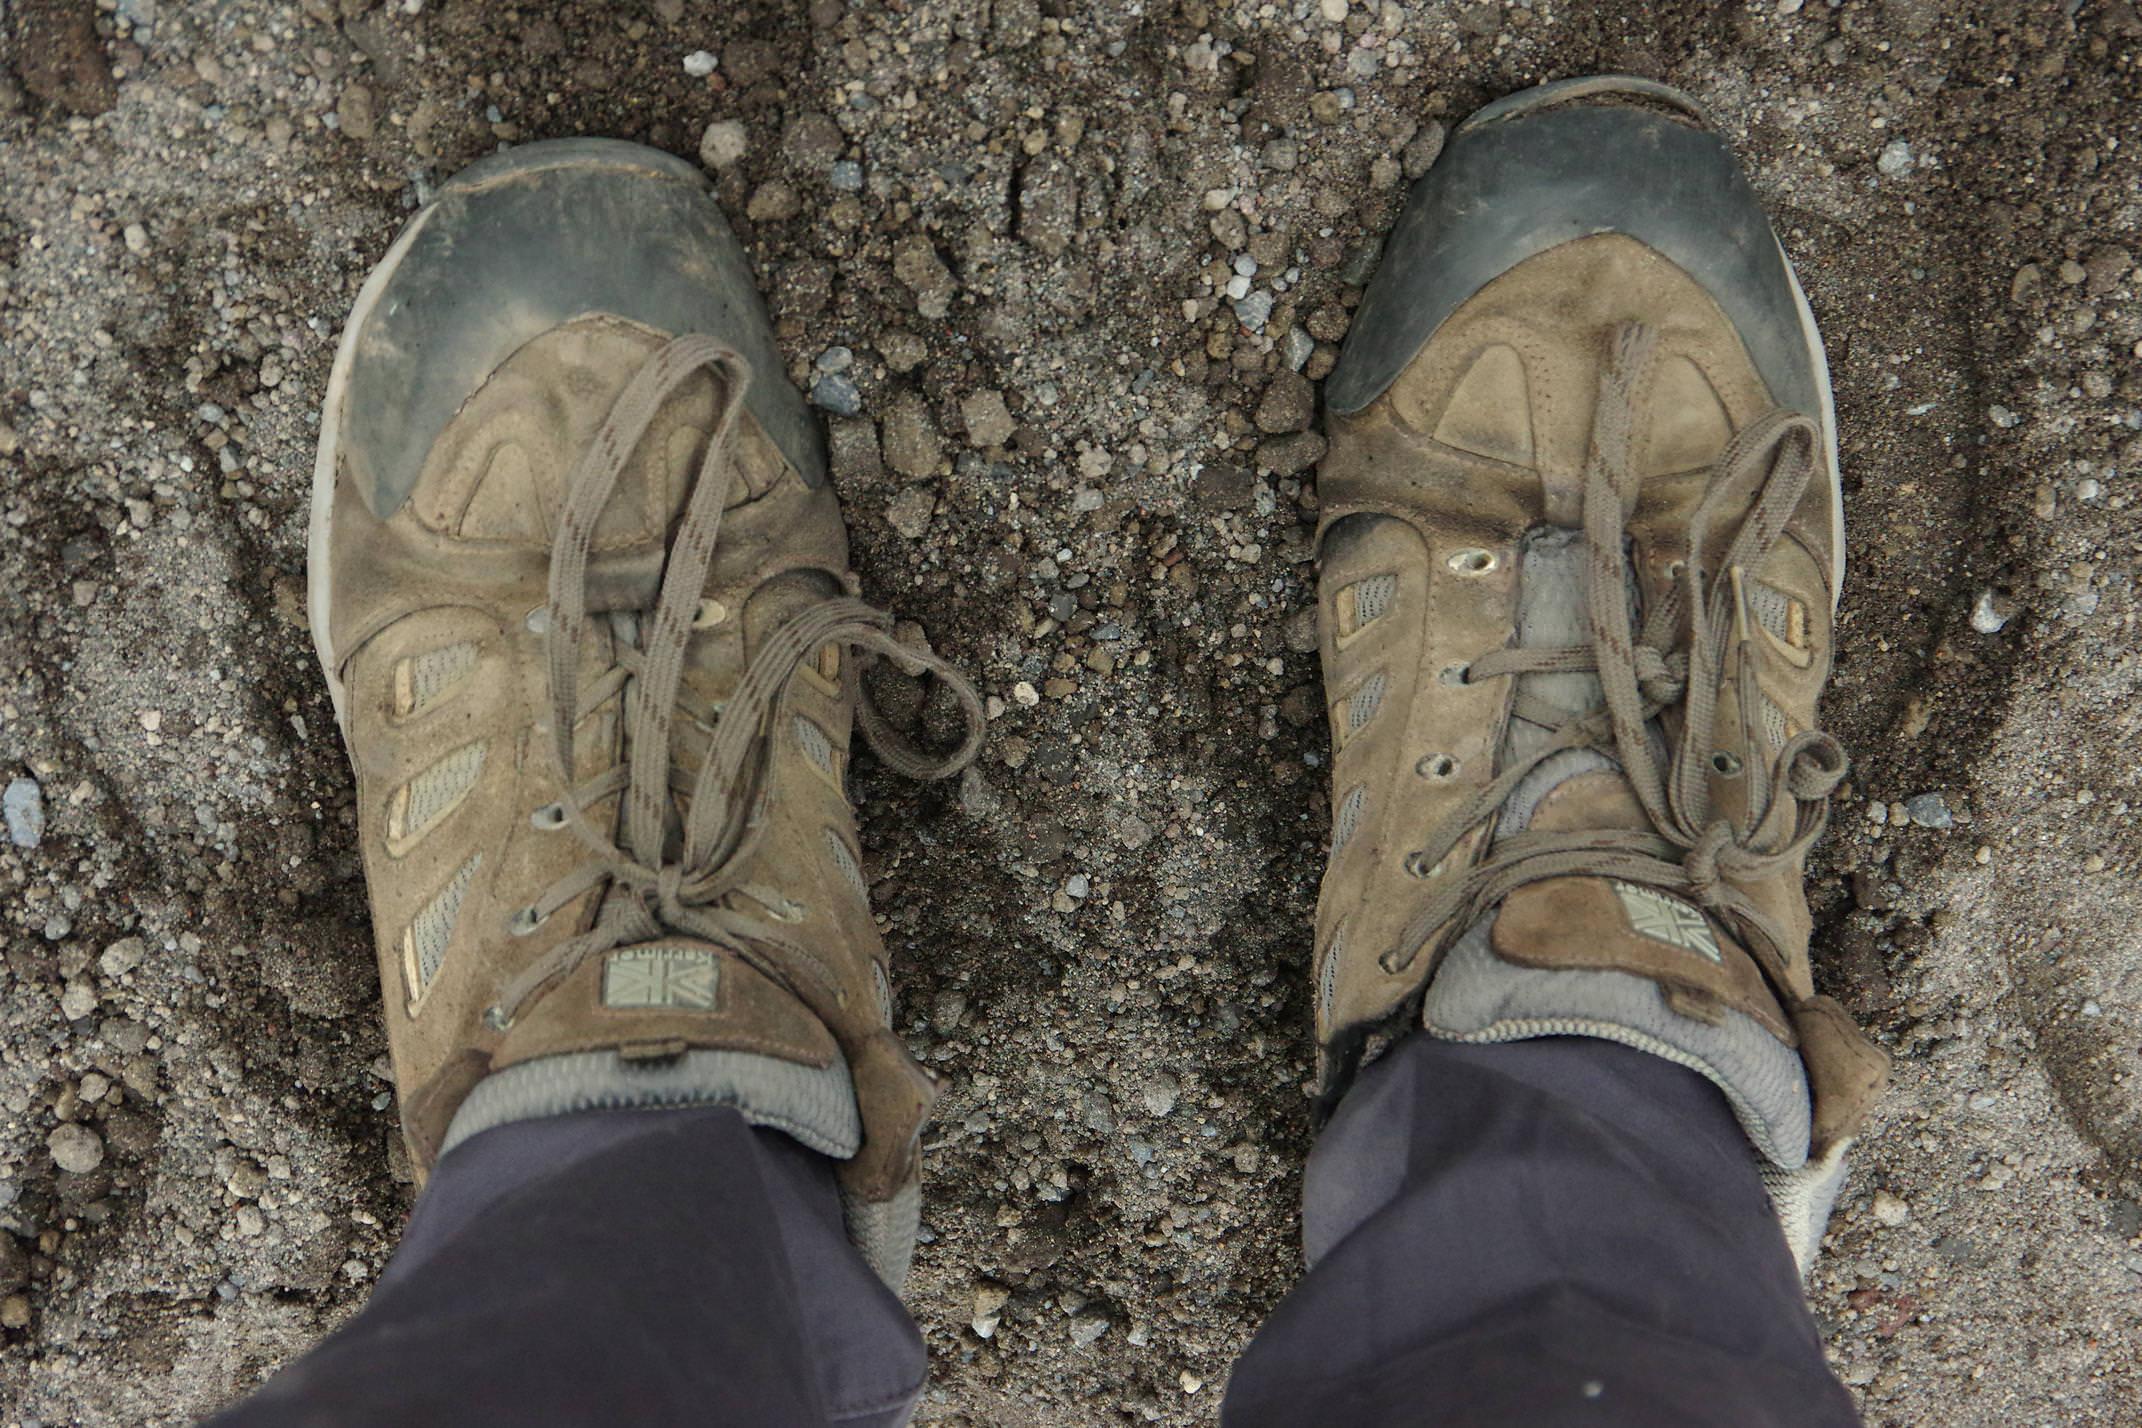 Ecuador cotopaxi walking boots hike refugio chris bladon